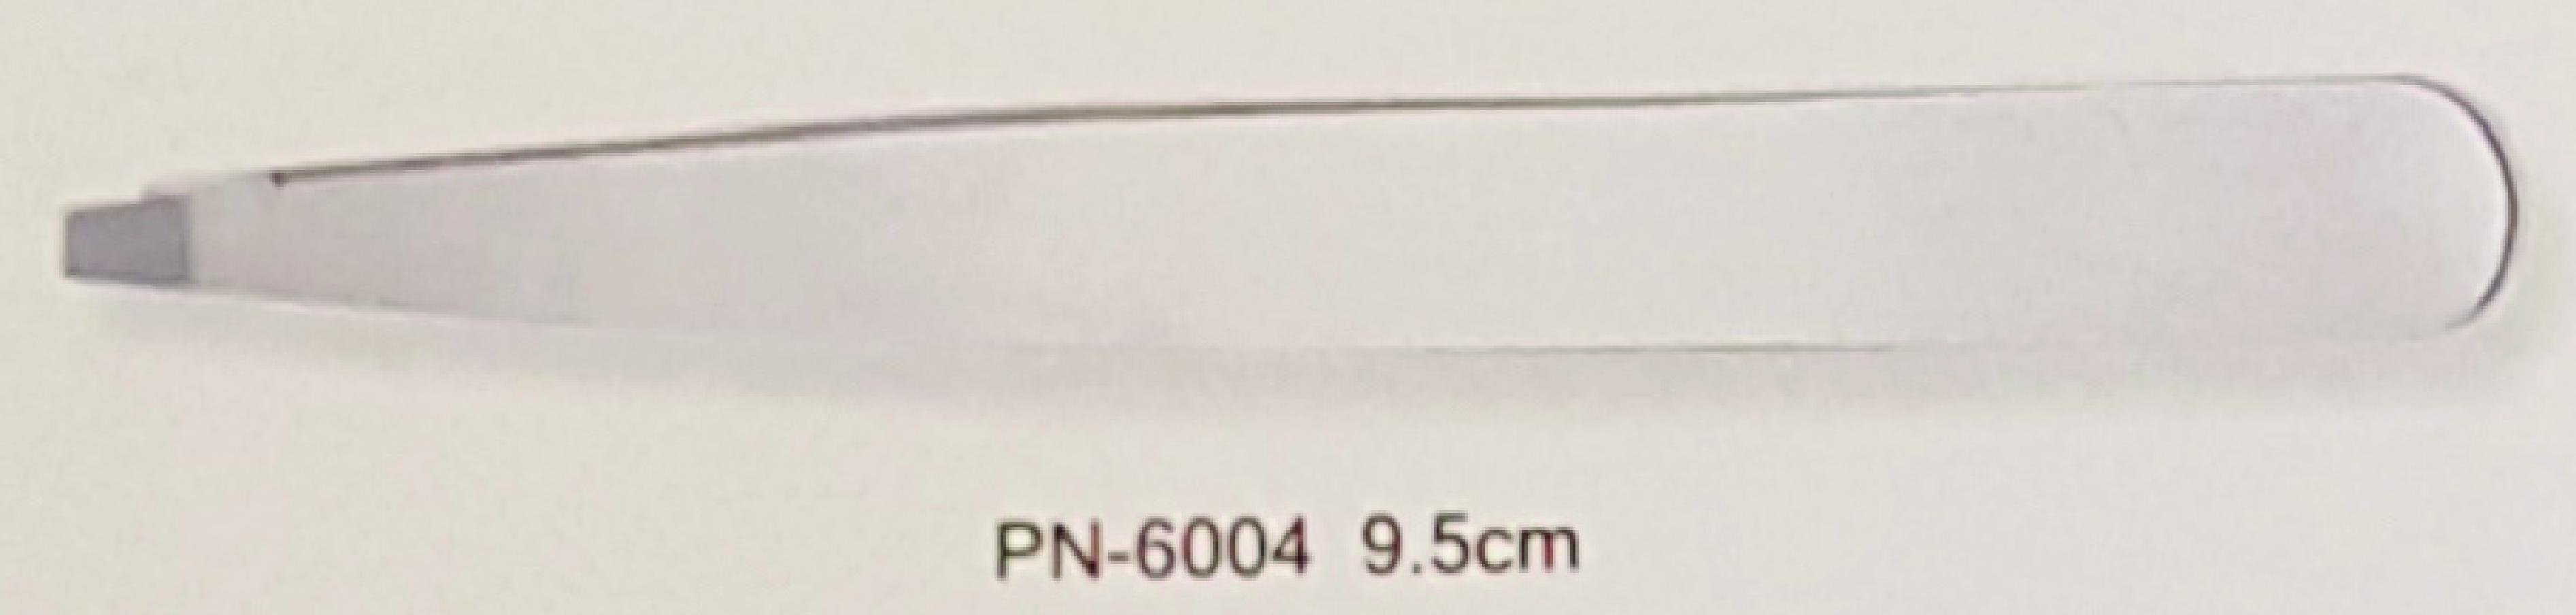 PN-6004 9.5cm